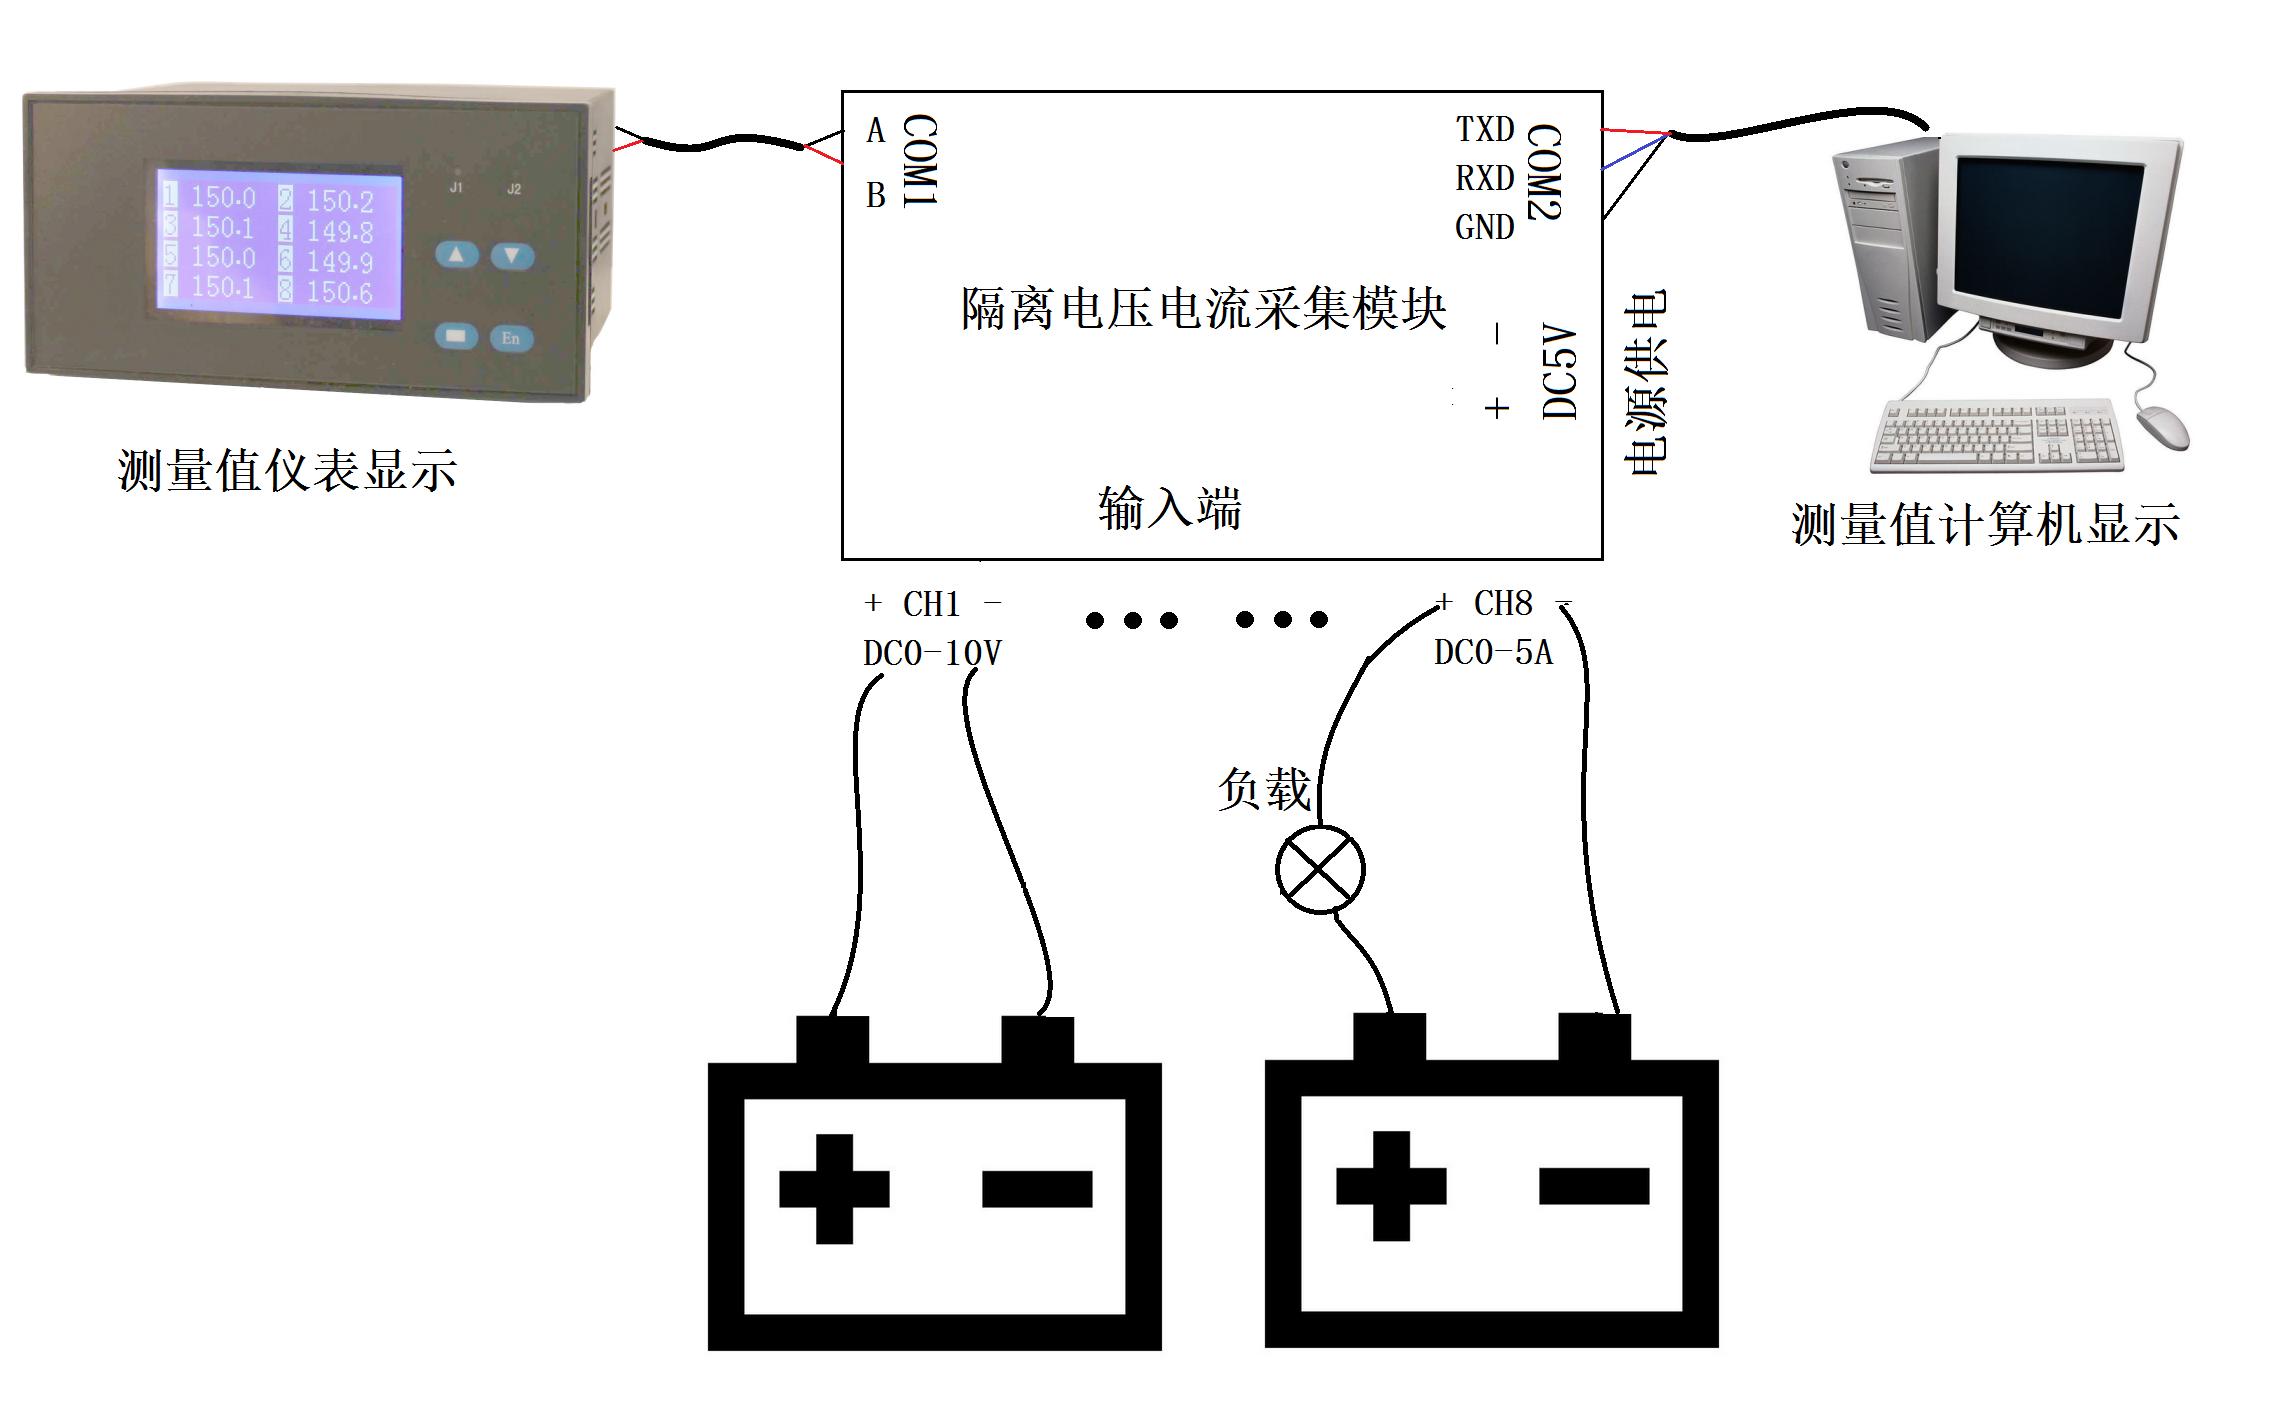 yk-zldydl-dcs-智能电压电流多通道计算机测量系统